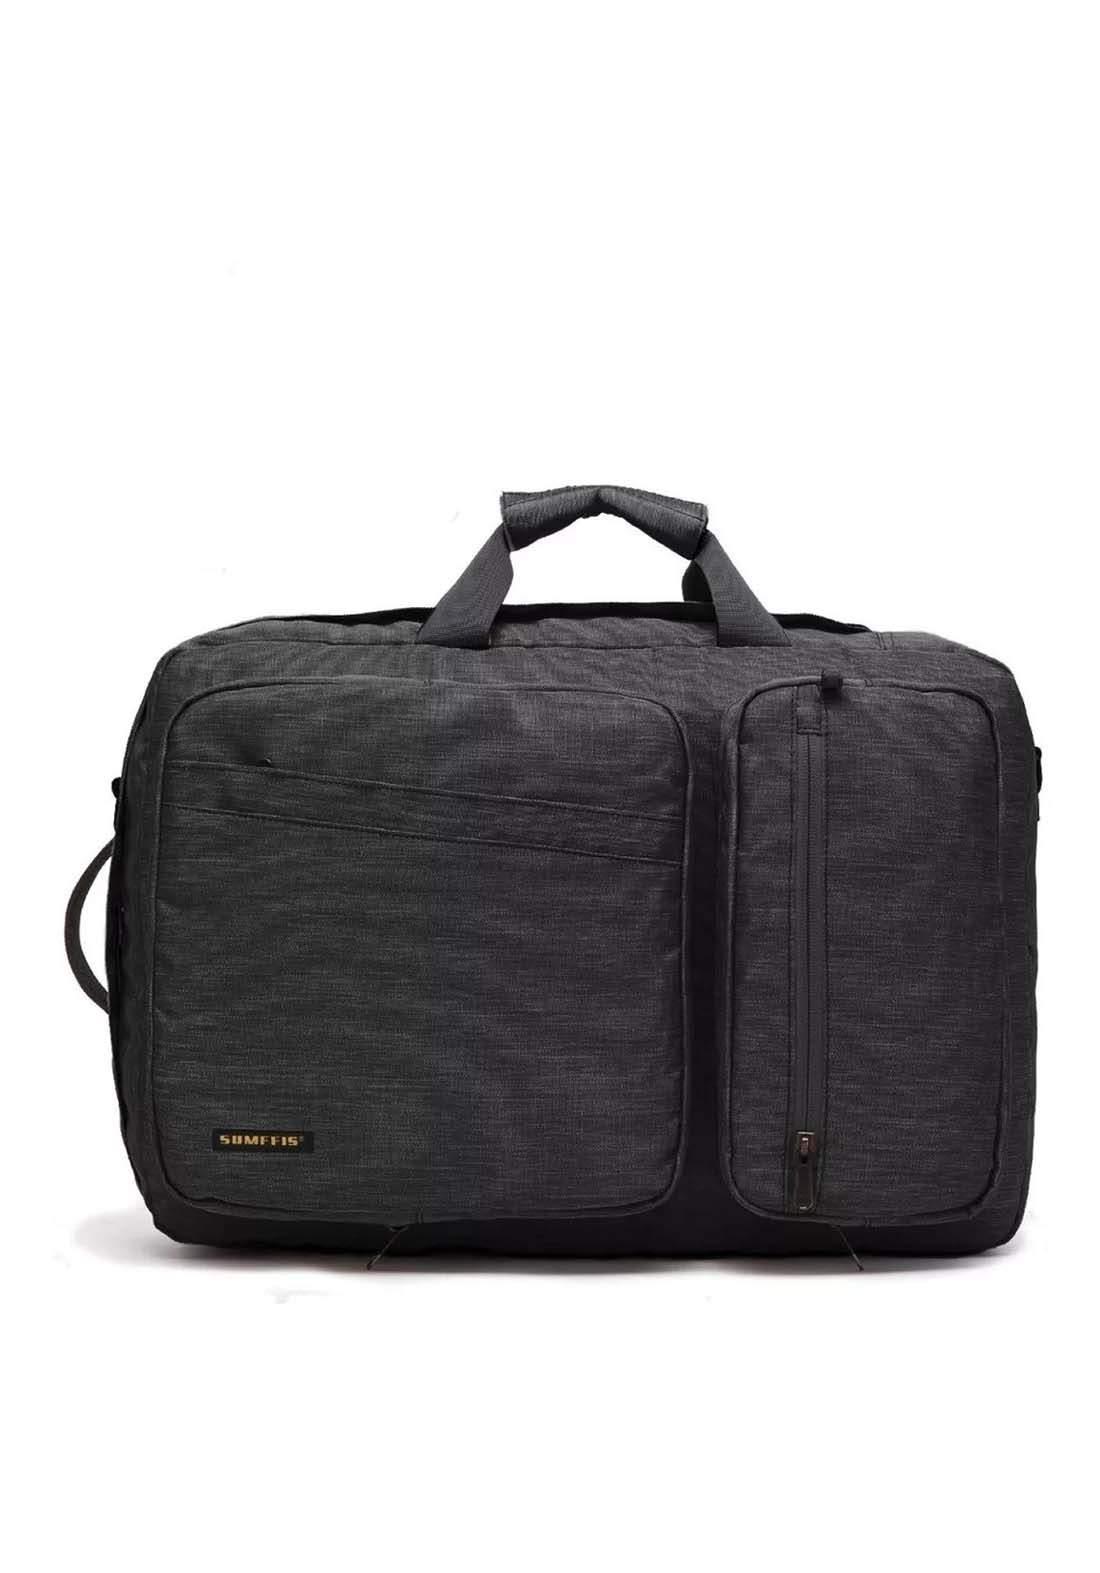 Laptop Bag Pack  9676  - Gray حقيبة لابتوب